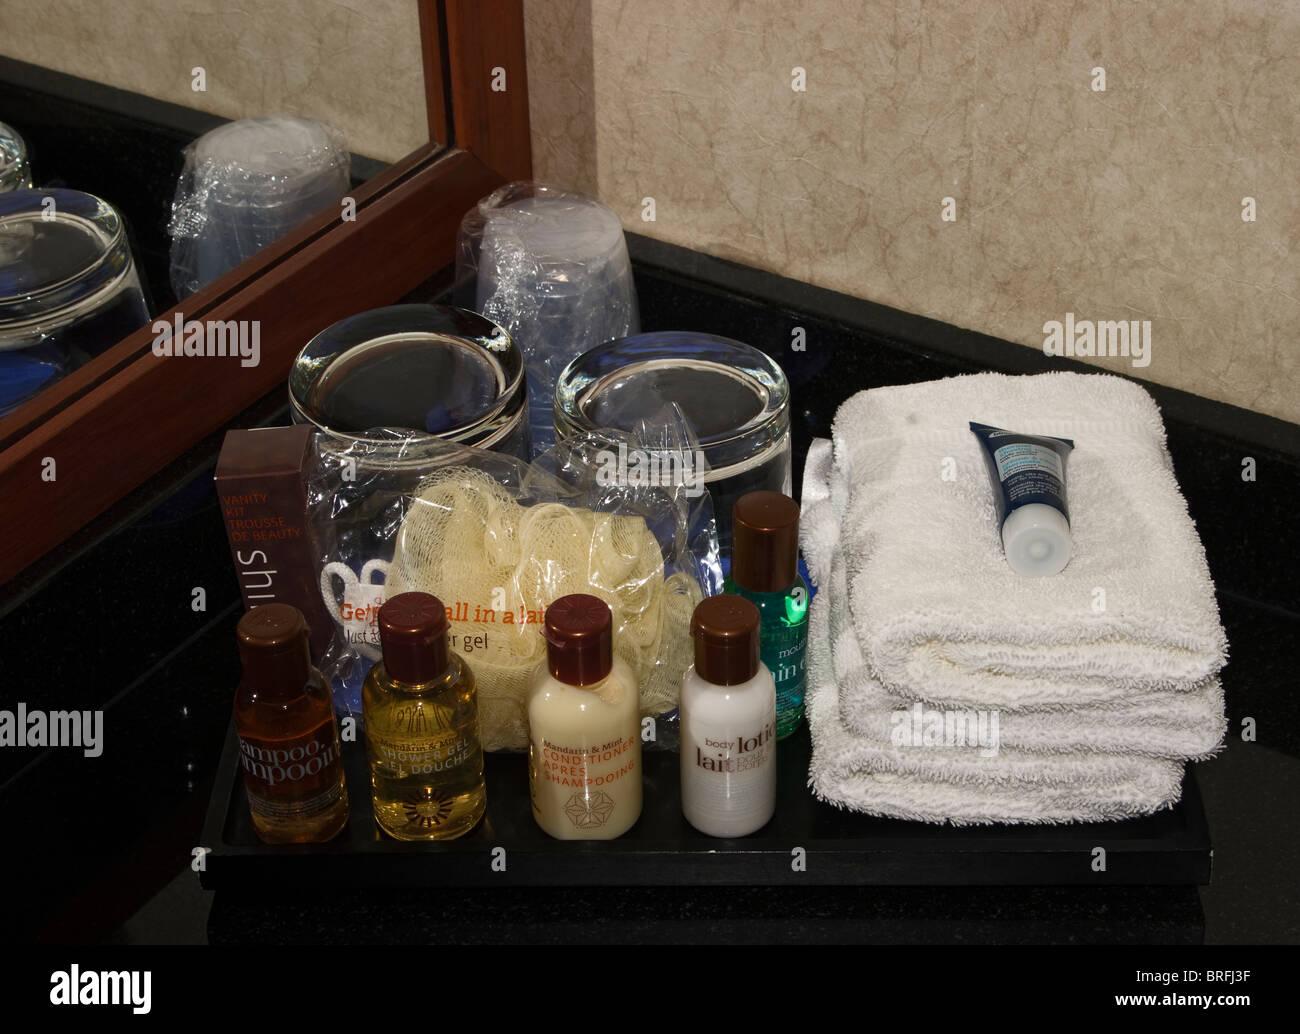 Hotel bathroom toiletries - Stock Image